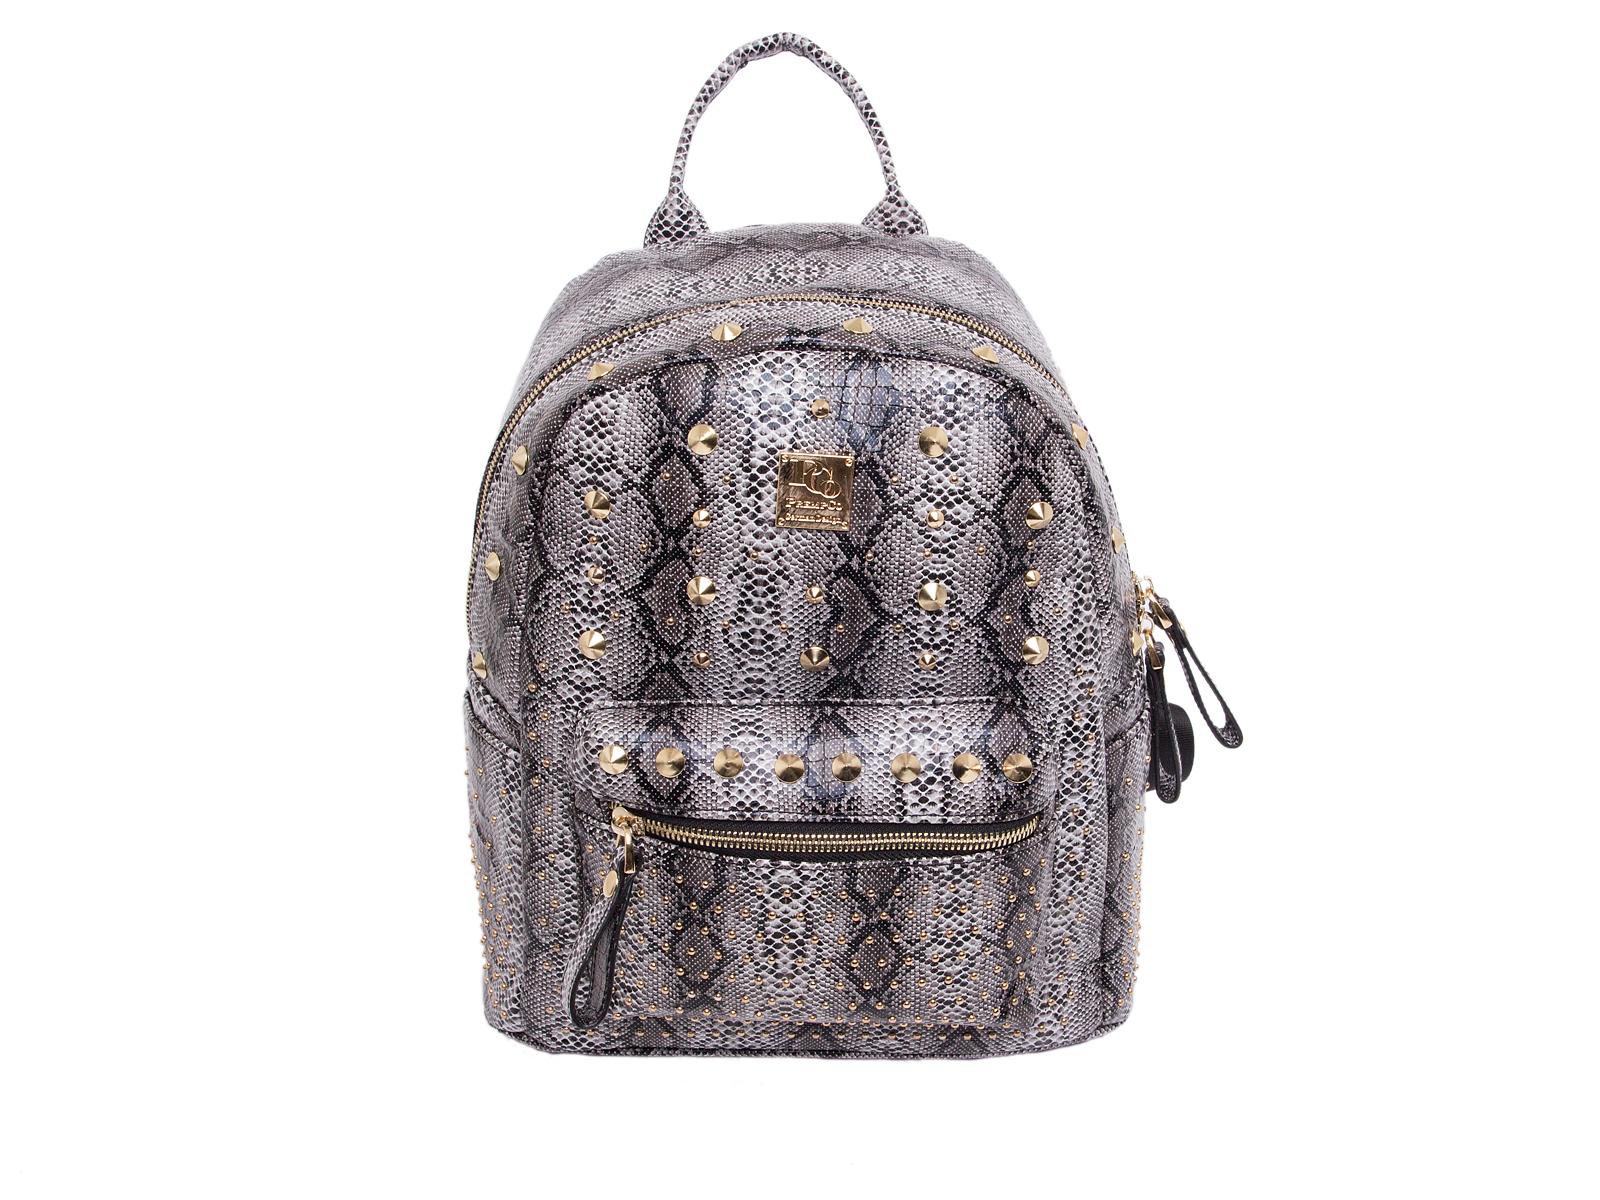 PCo Viper herren rucksack Grau Designer Rucksack Luxus